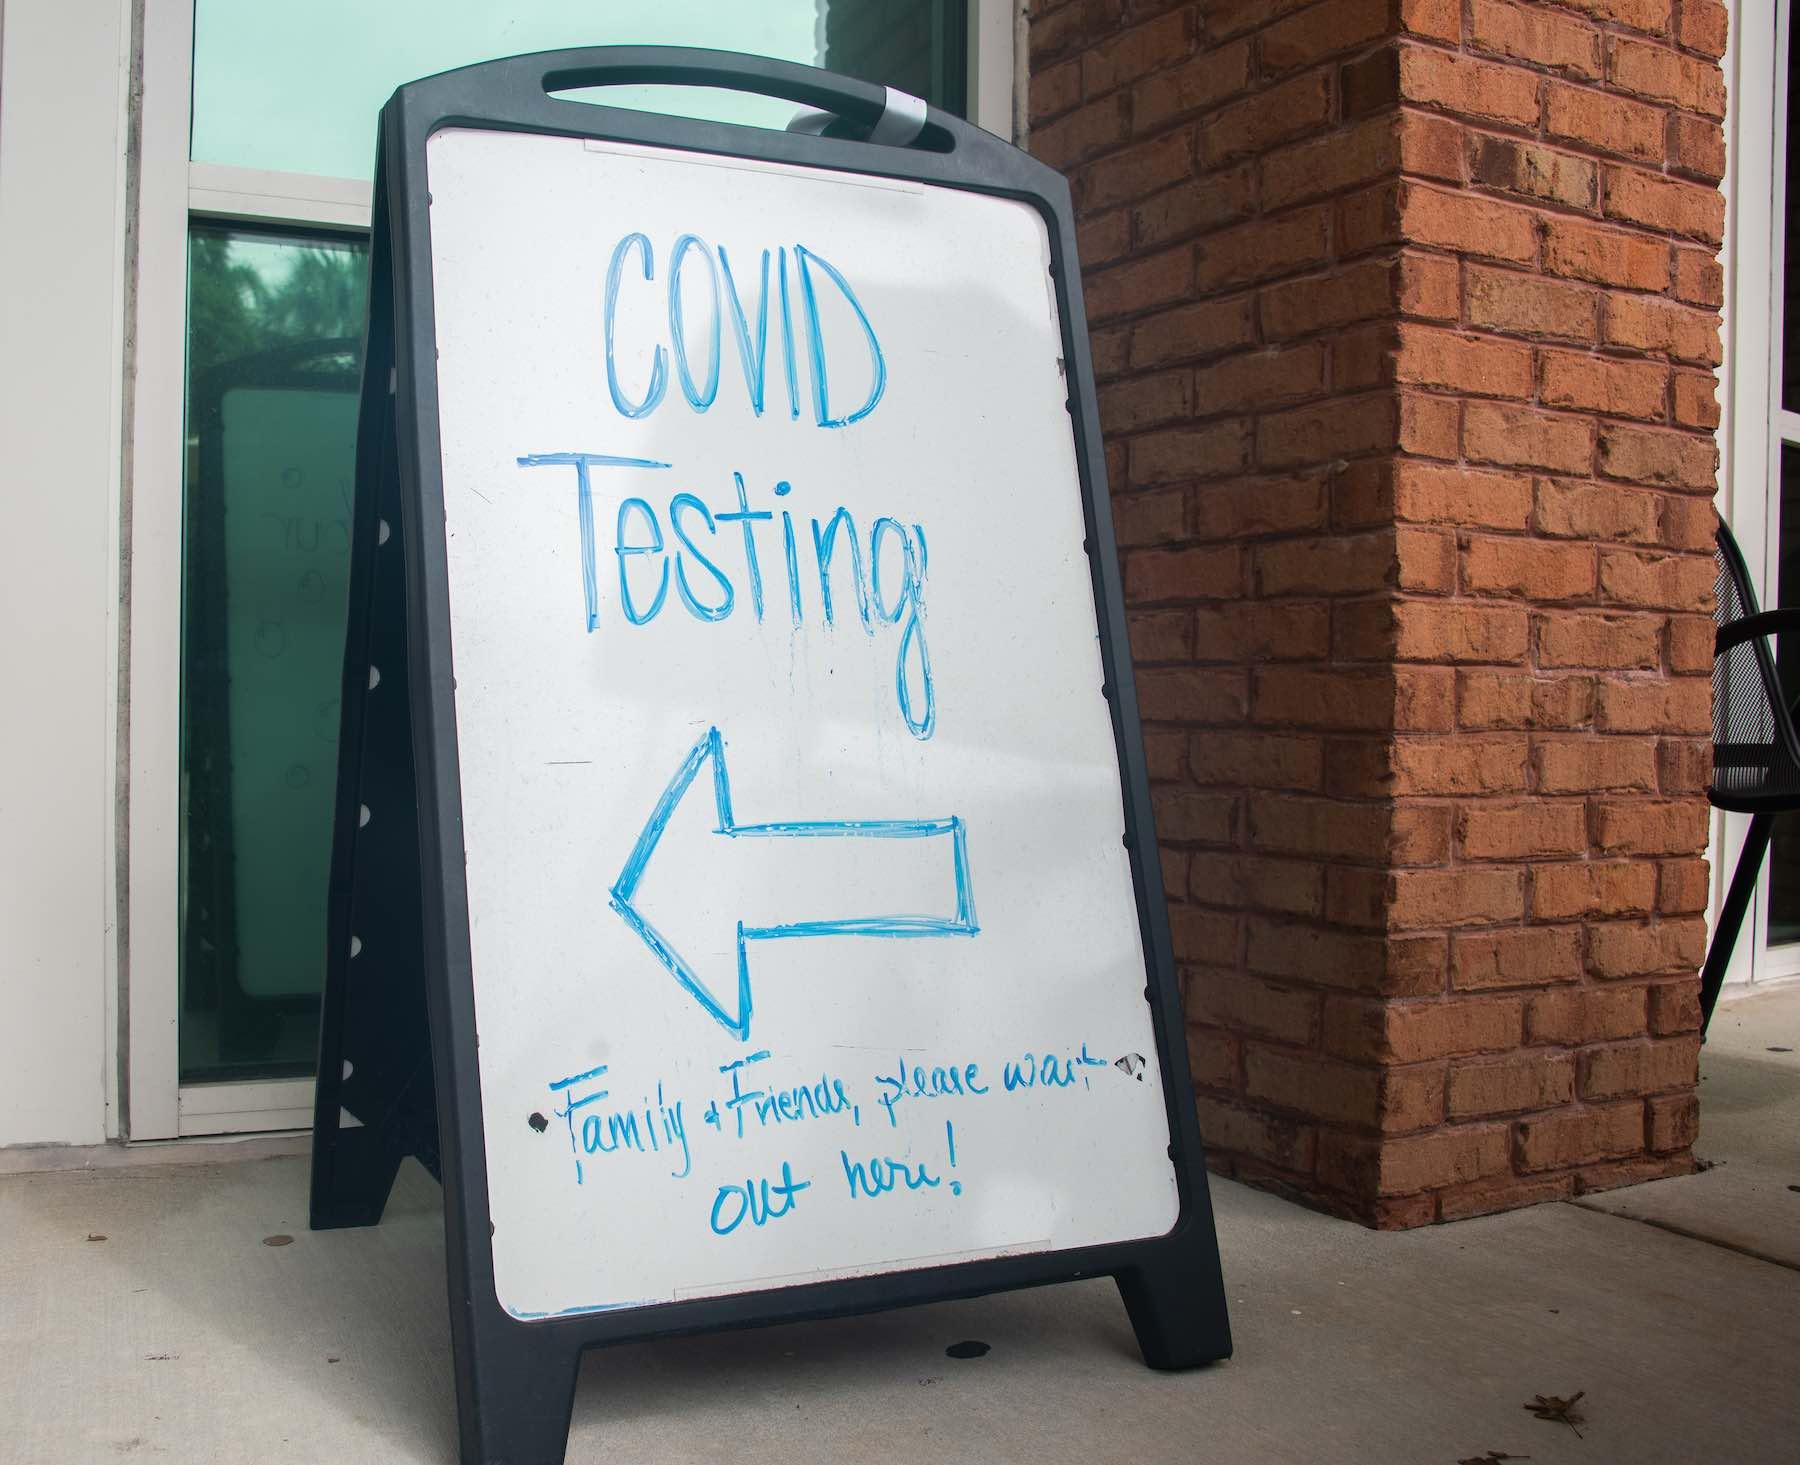 A sandwich board sign says COVID-19 testing